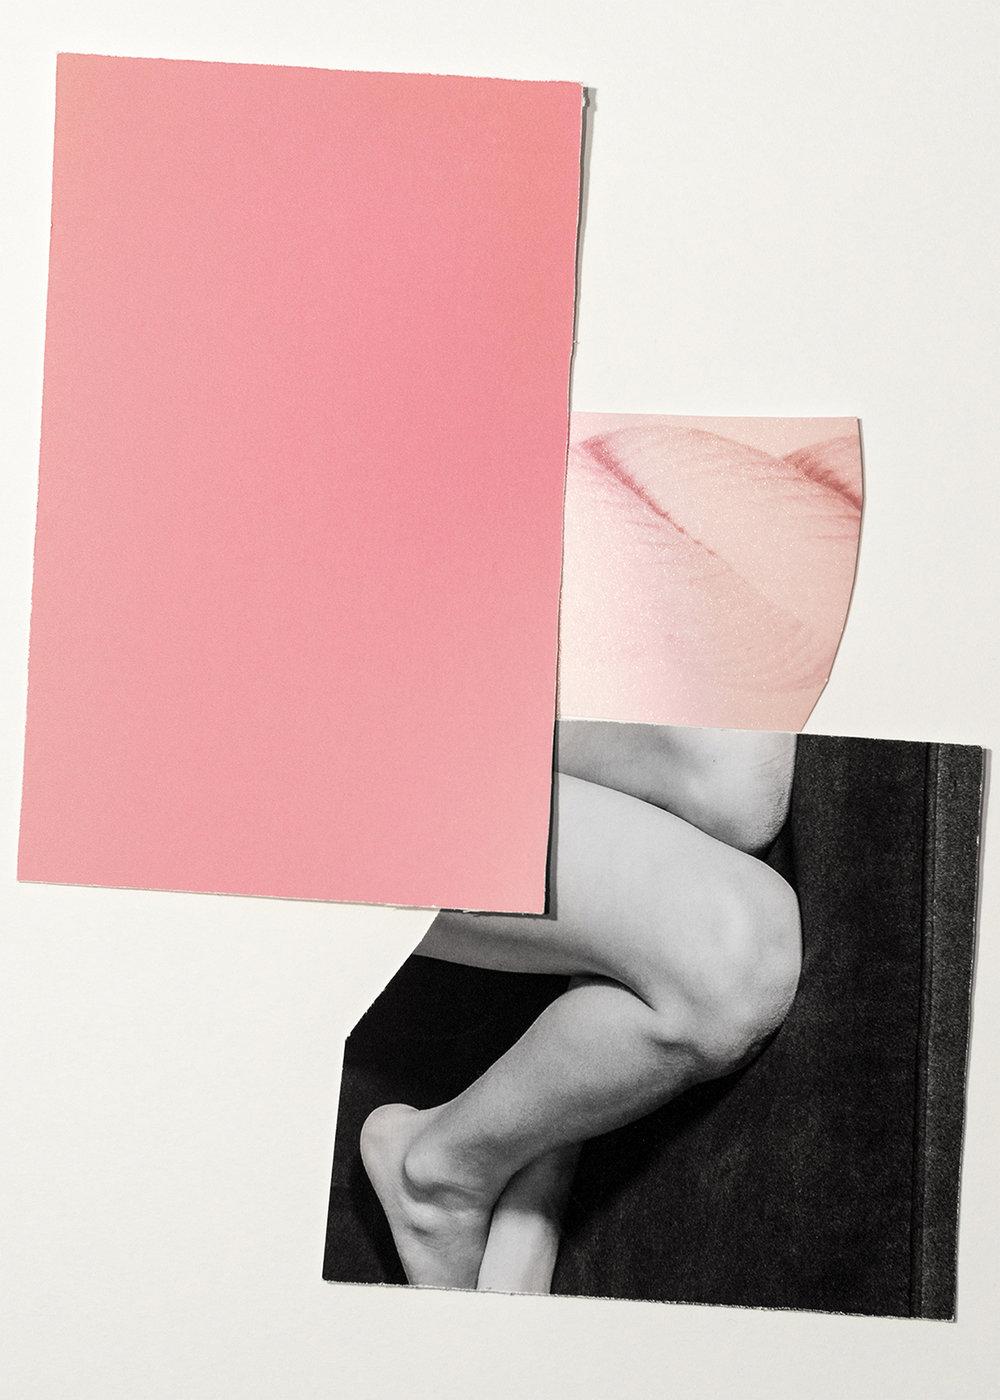 © Stephanie Taiber